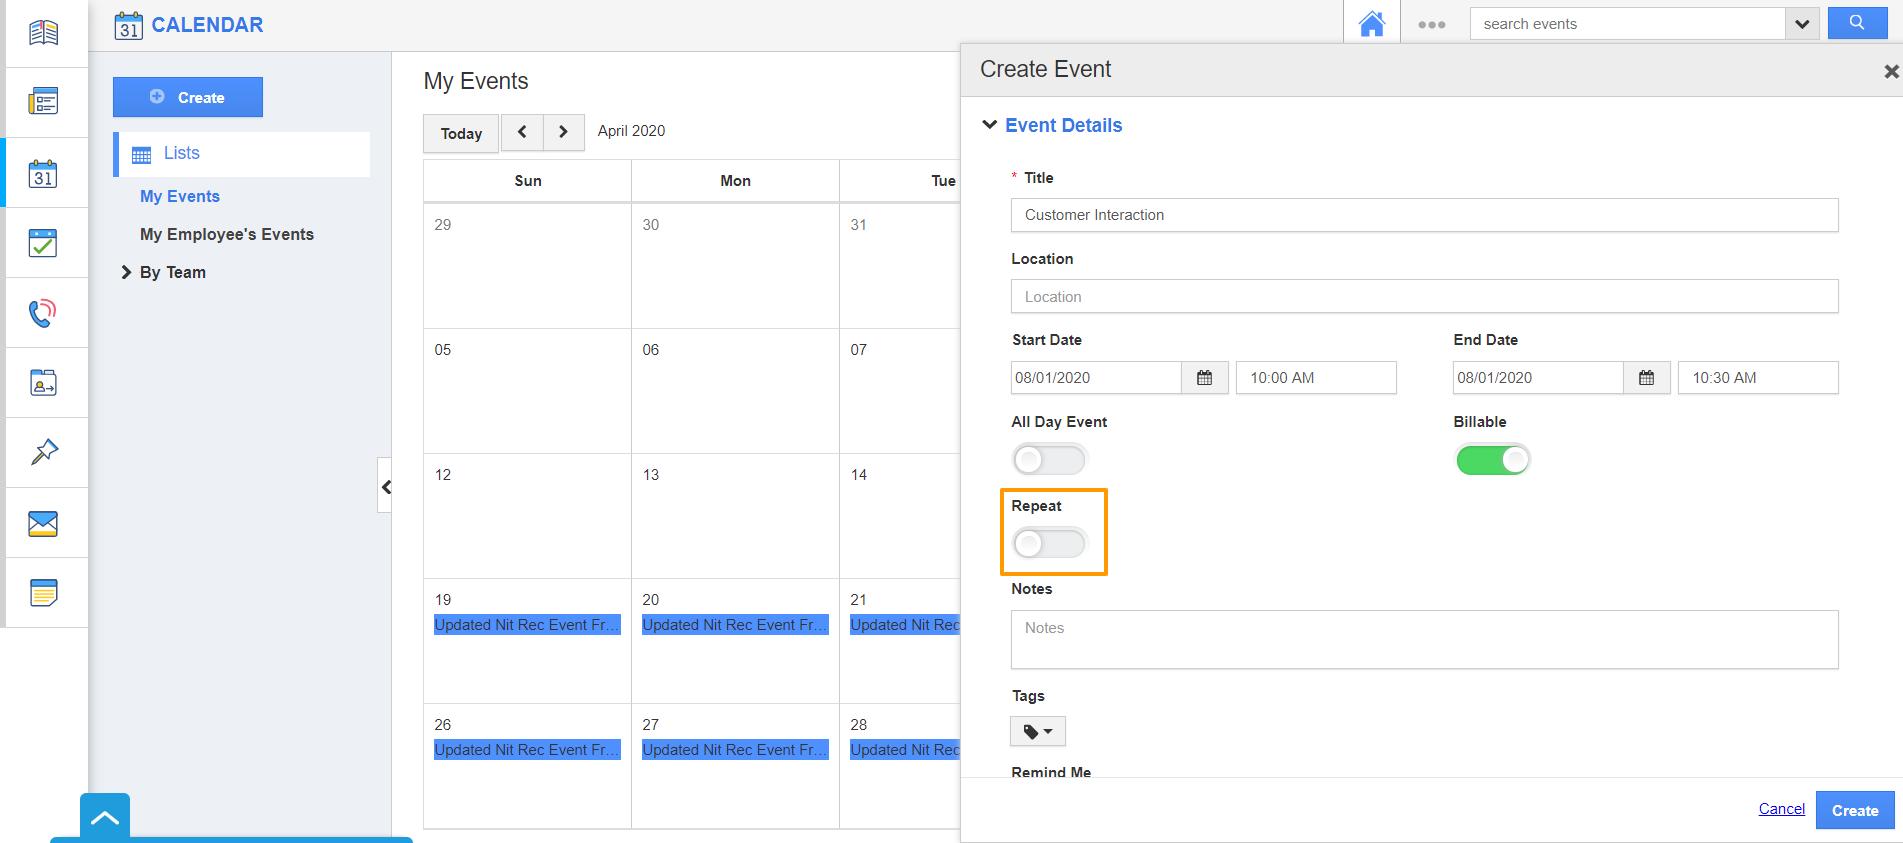 Create Event